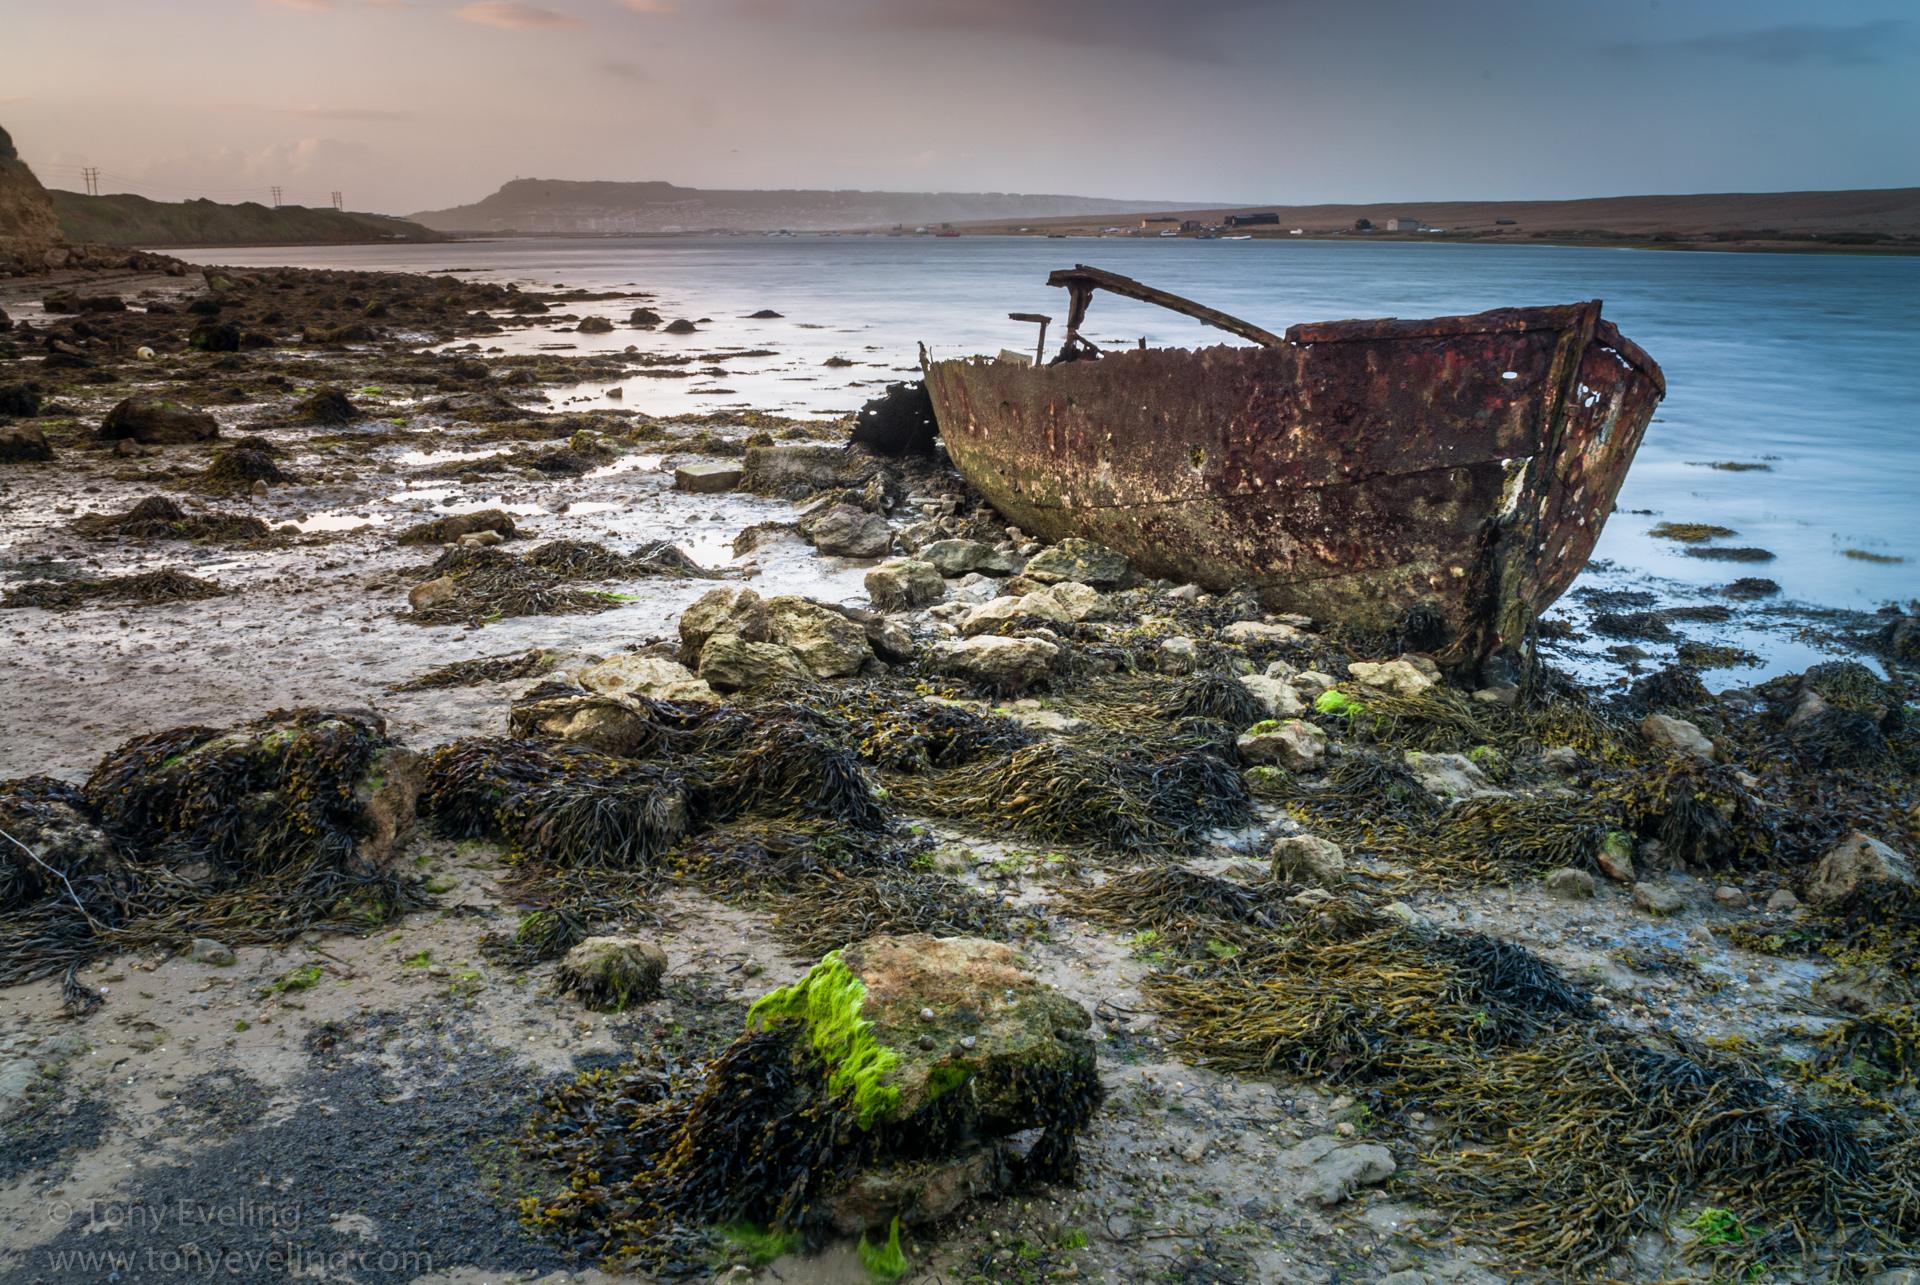 Rusty old boat abandoned in Fleet L:agoon, Chesil Beach, Dorset